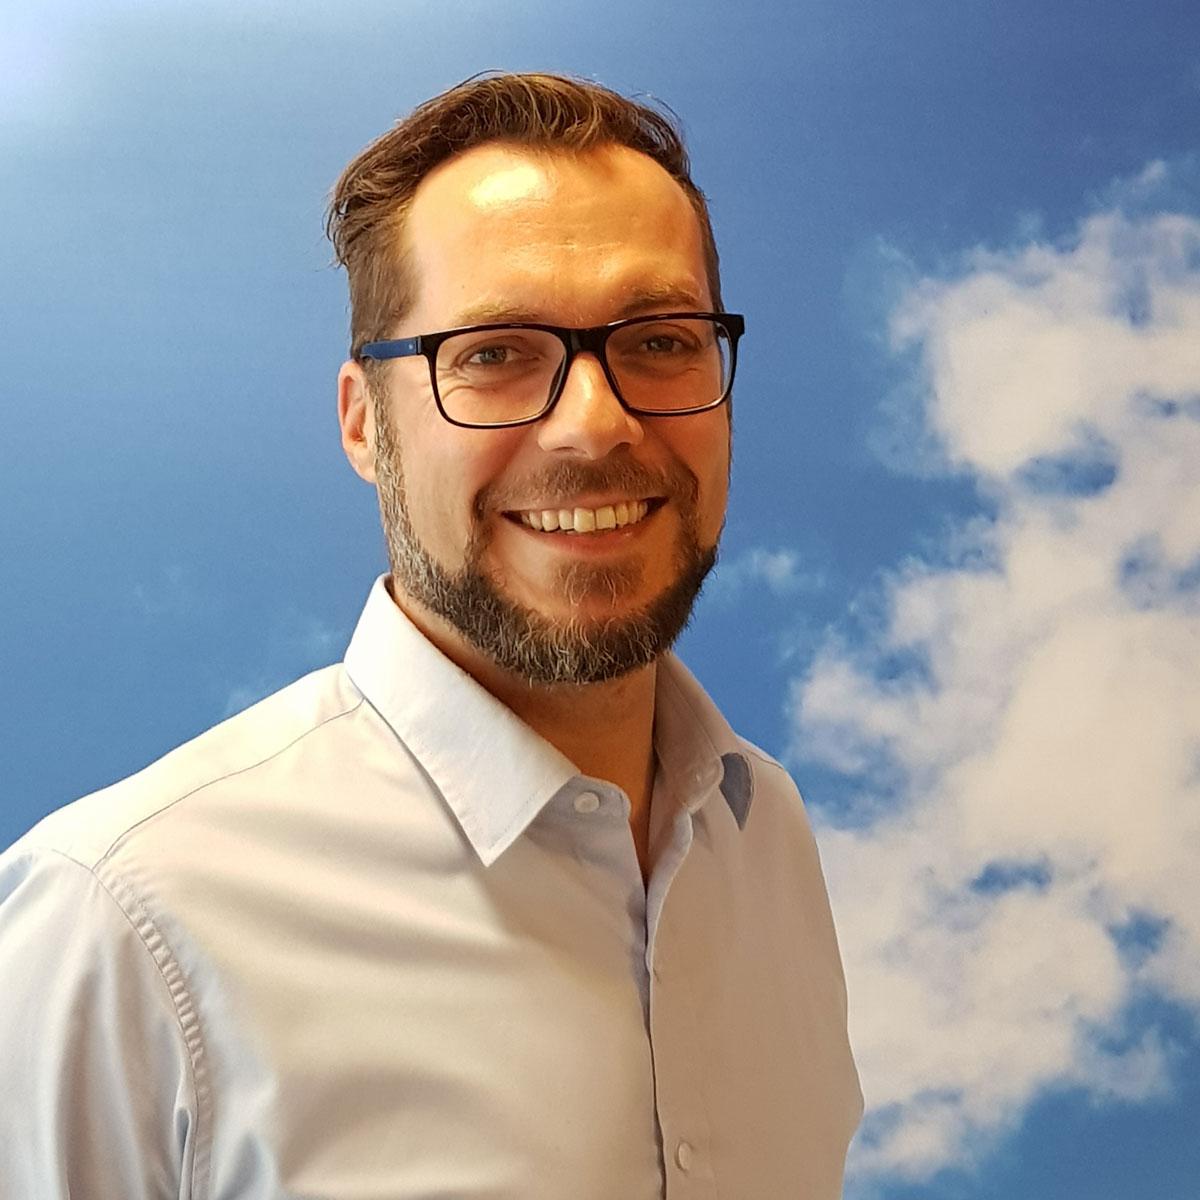 Bengt Bergt